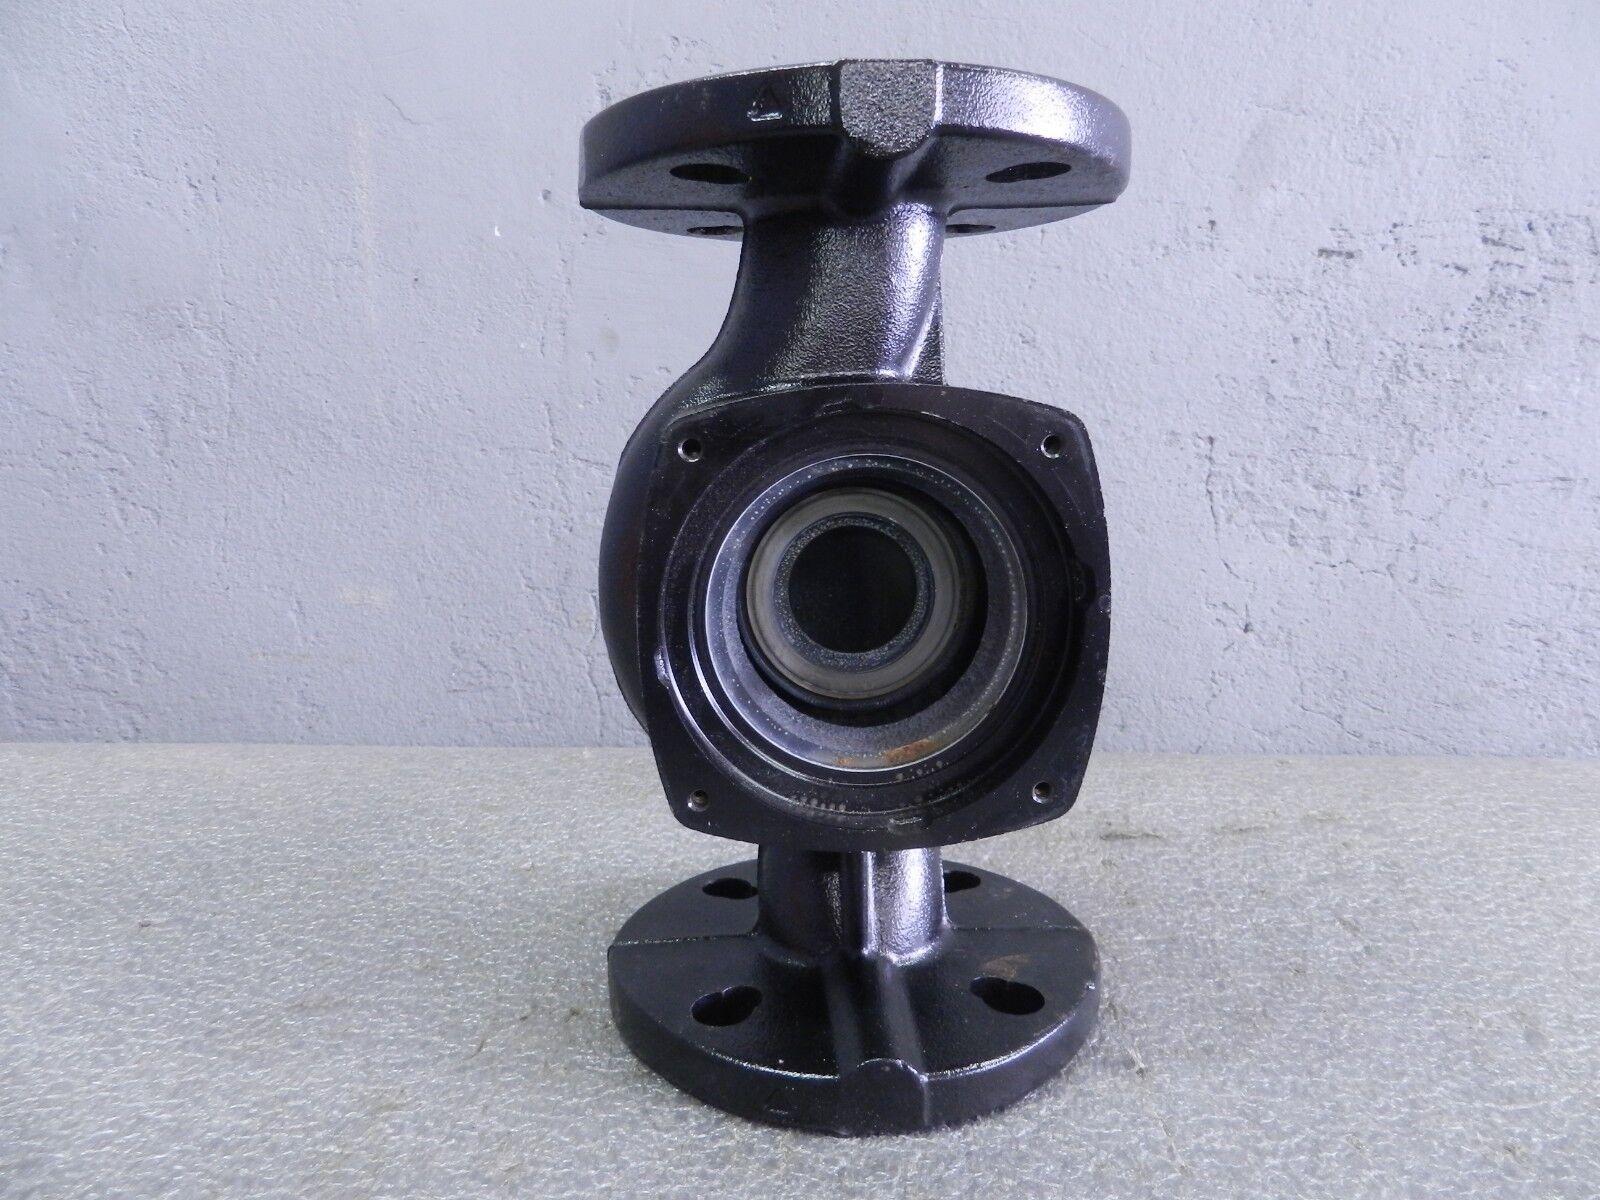 Wilo Stratos 50/1-12 280 mm Leergehäuse Pumpengehäuse Flanschgehäuse 2095504